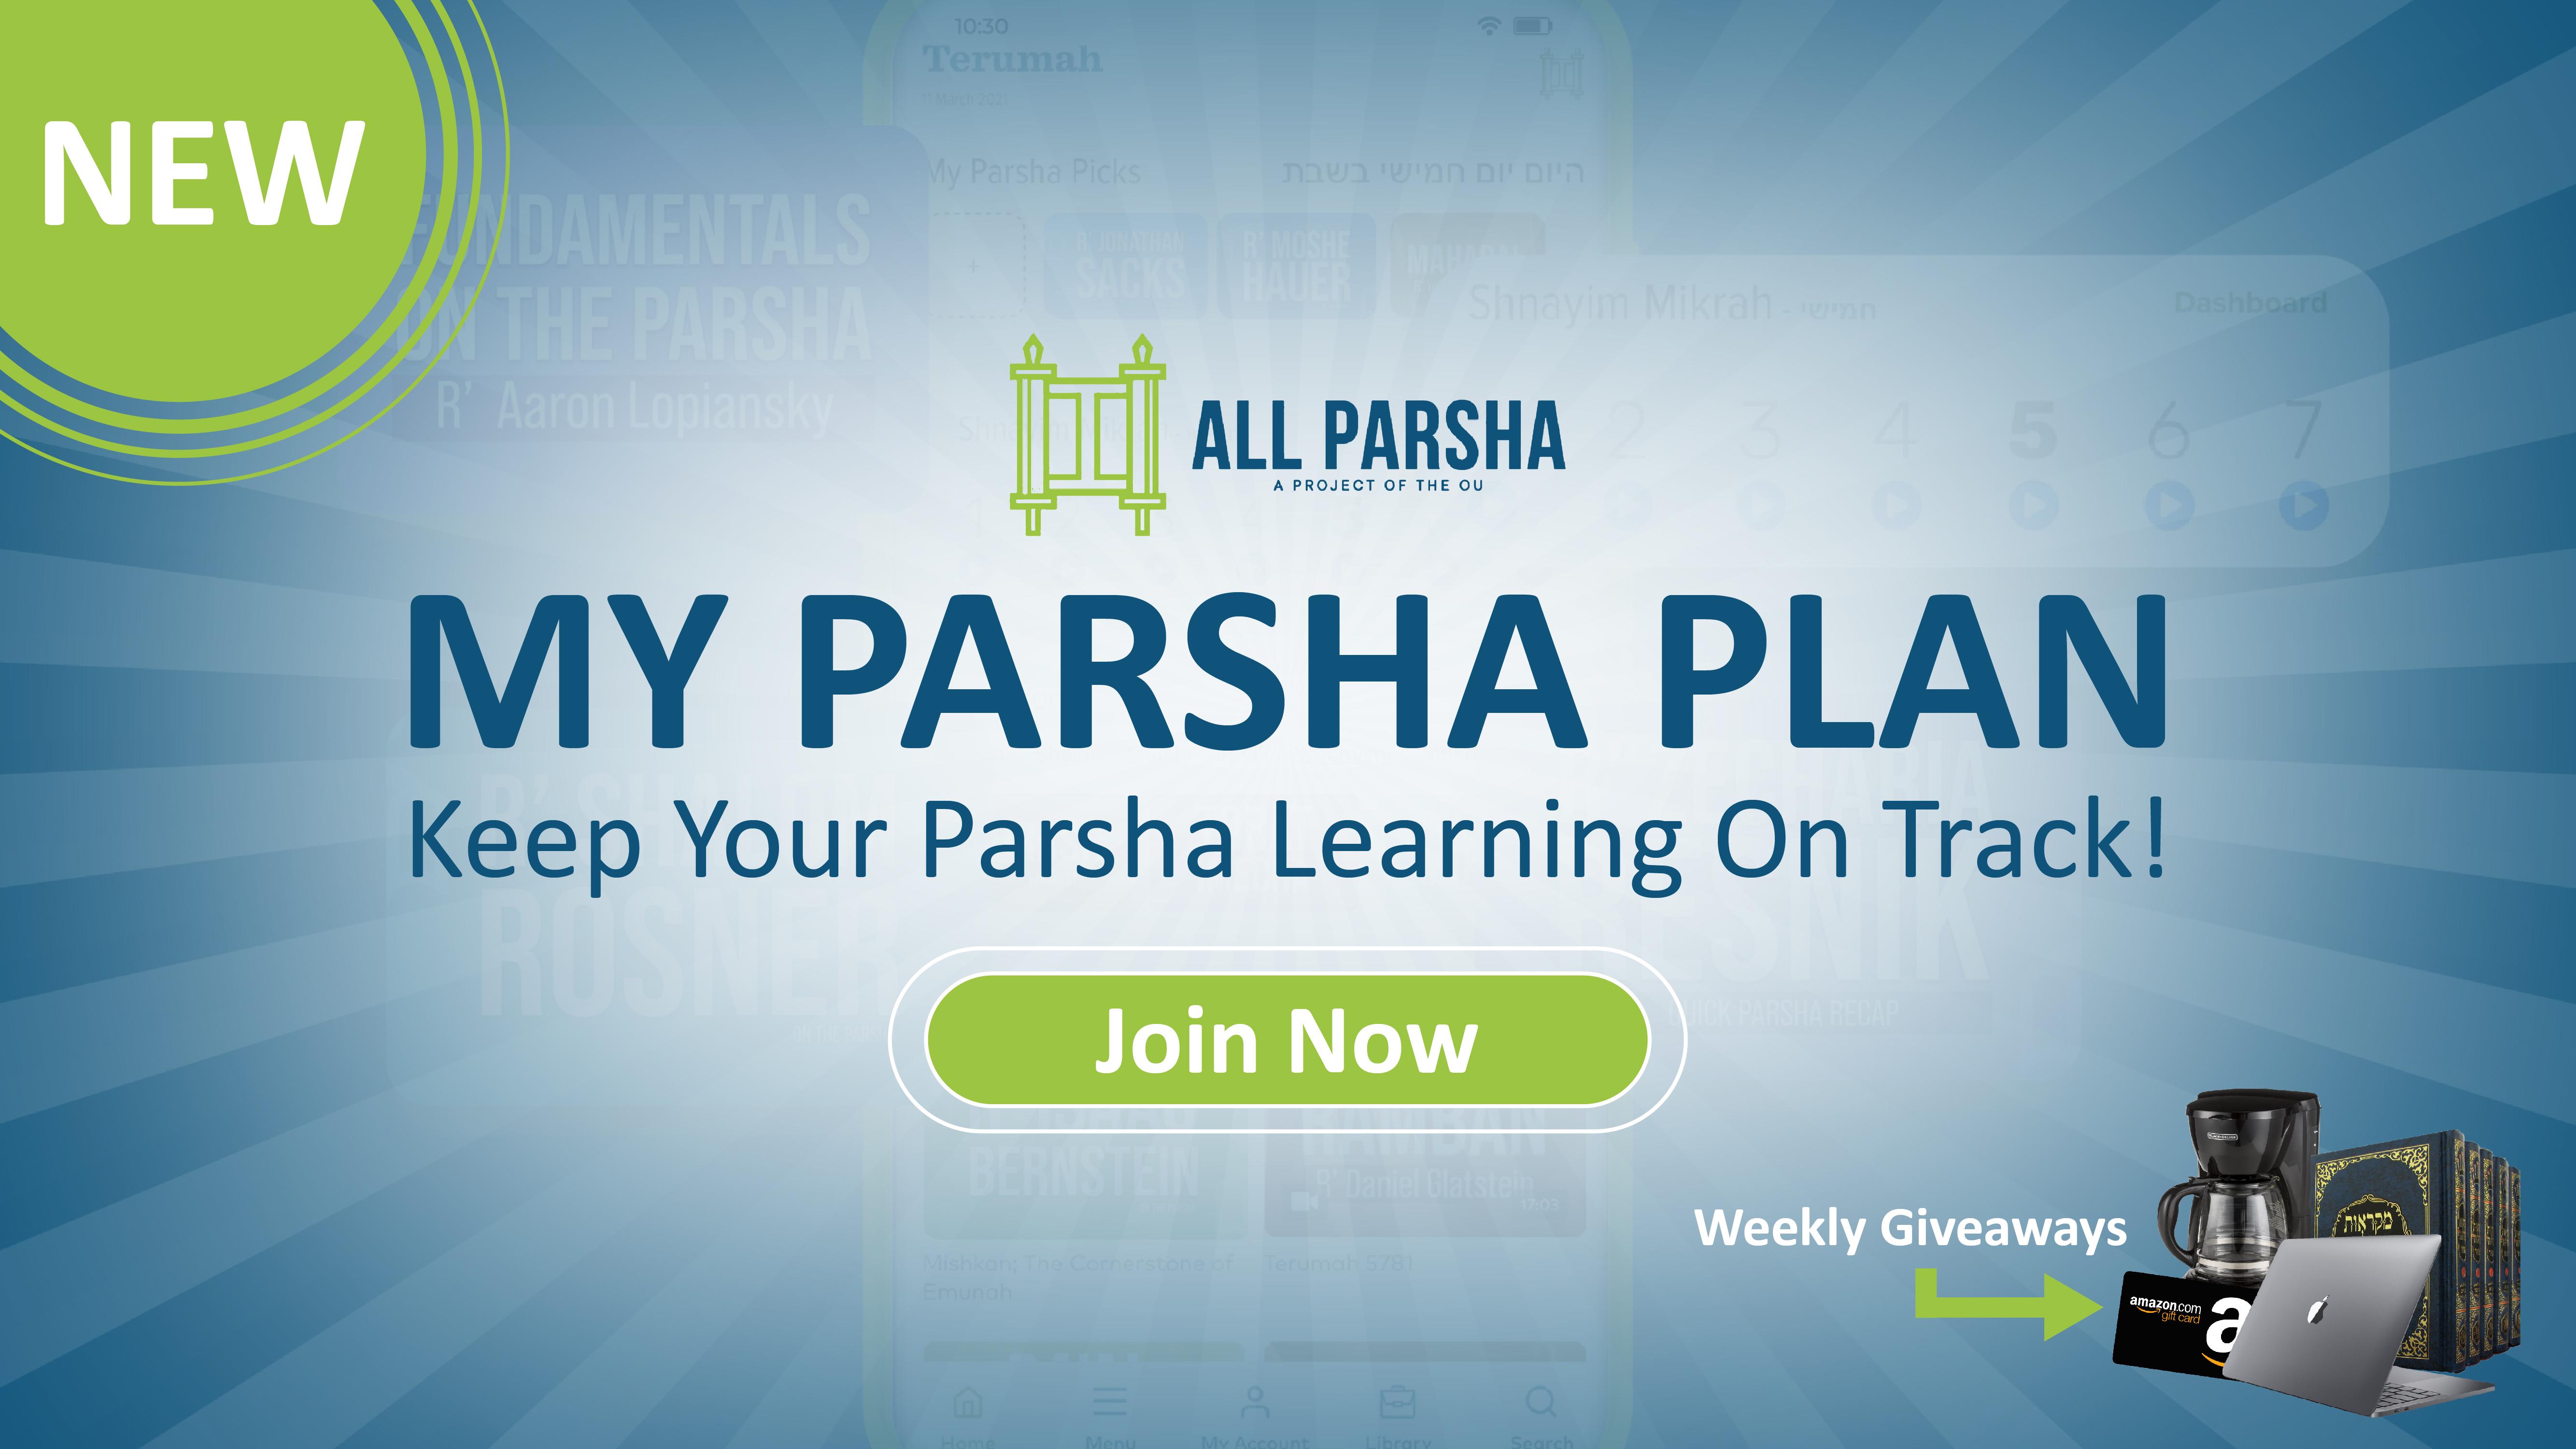 All Parsha Hero image